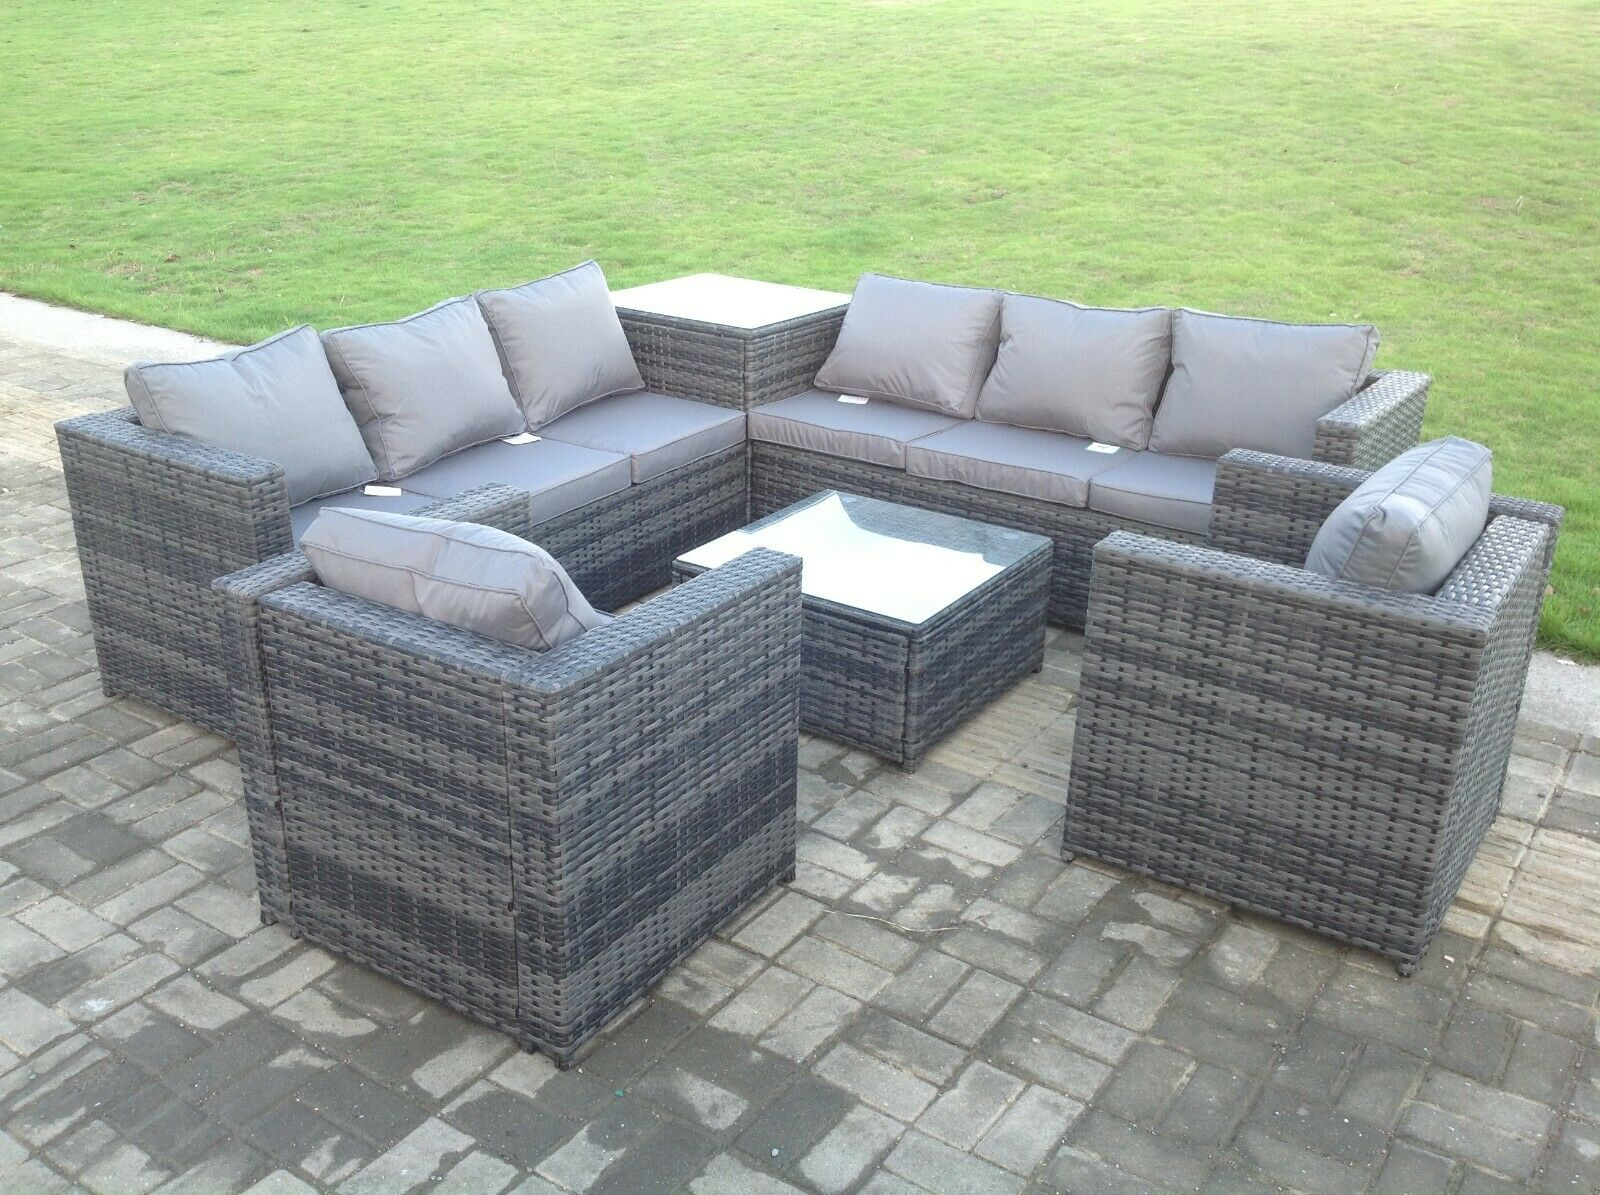 Garden Furniture - 8 seater grey rattan corner sofa chair table outdoor garden furniture patio set